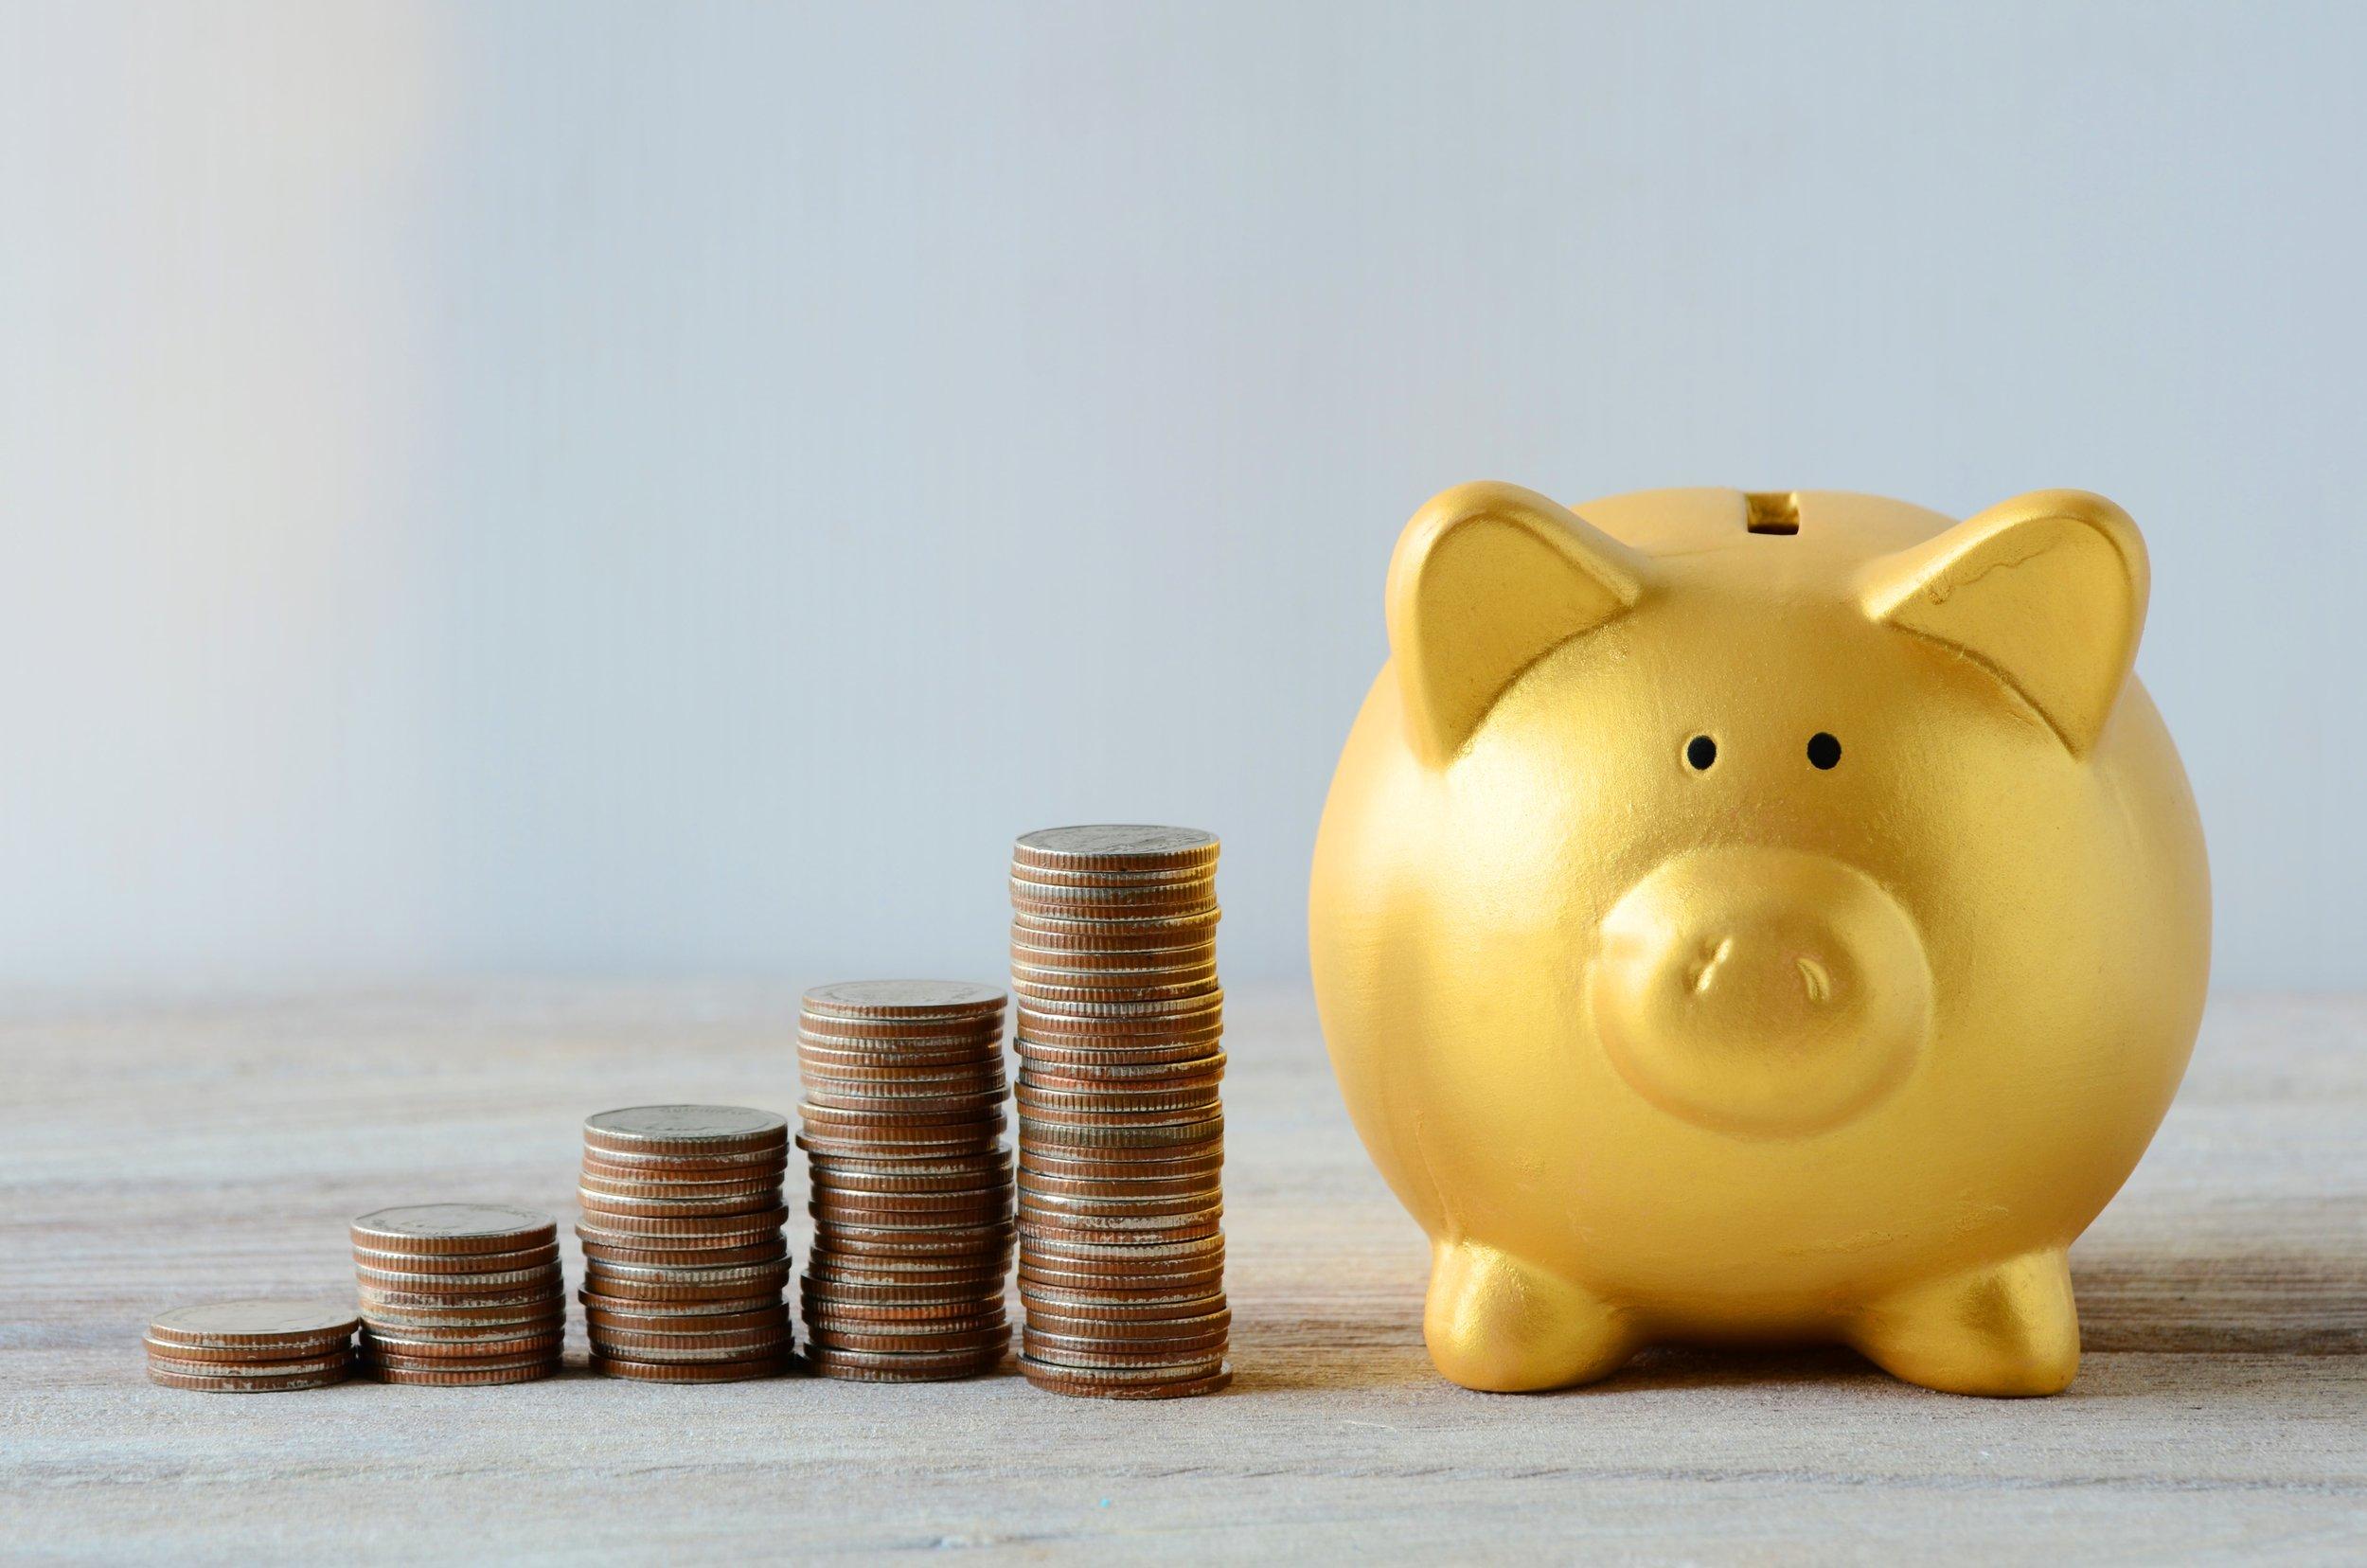 Gold piggy_build wealth-min.jpg